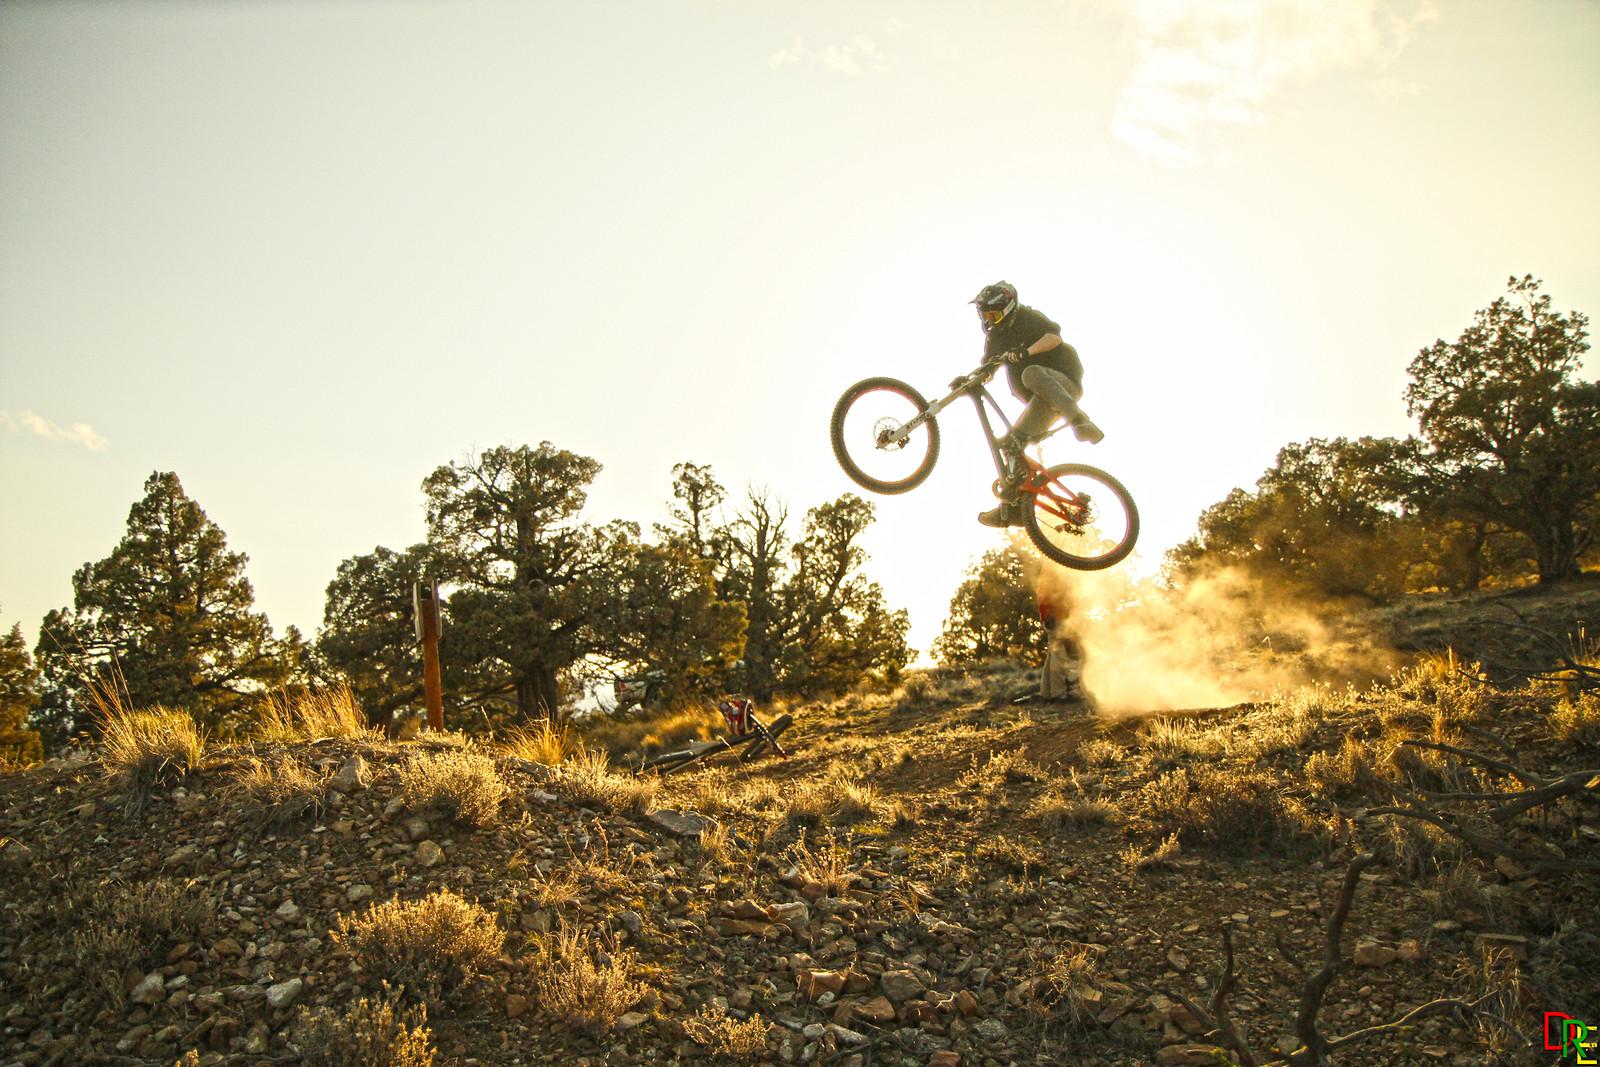 NikNak - norcalproductions - Mountain Biking Pictures - Vital MTB